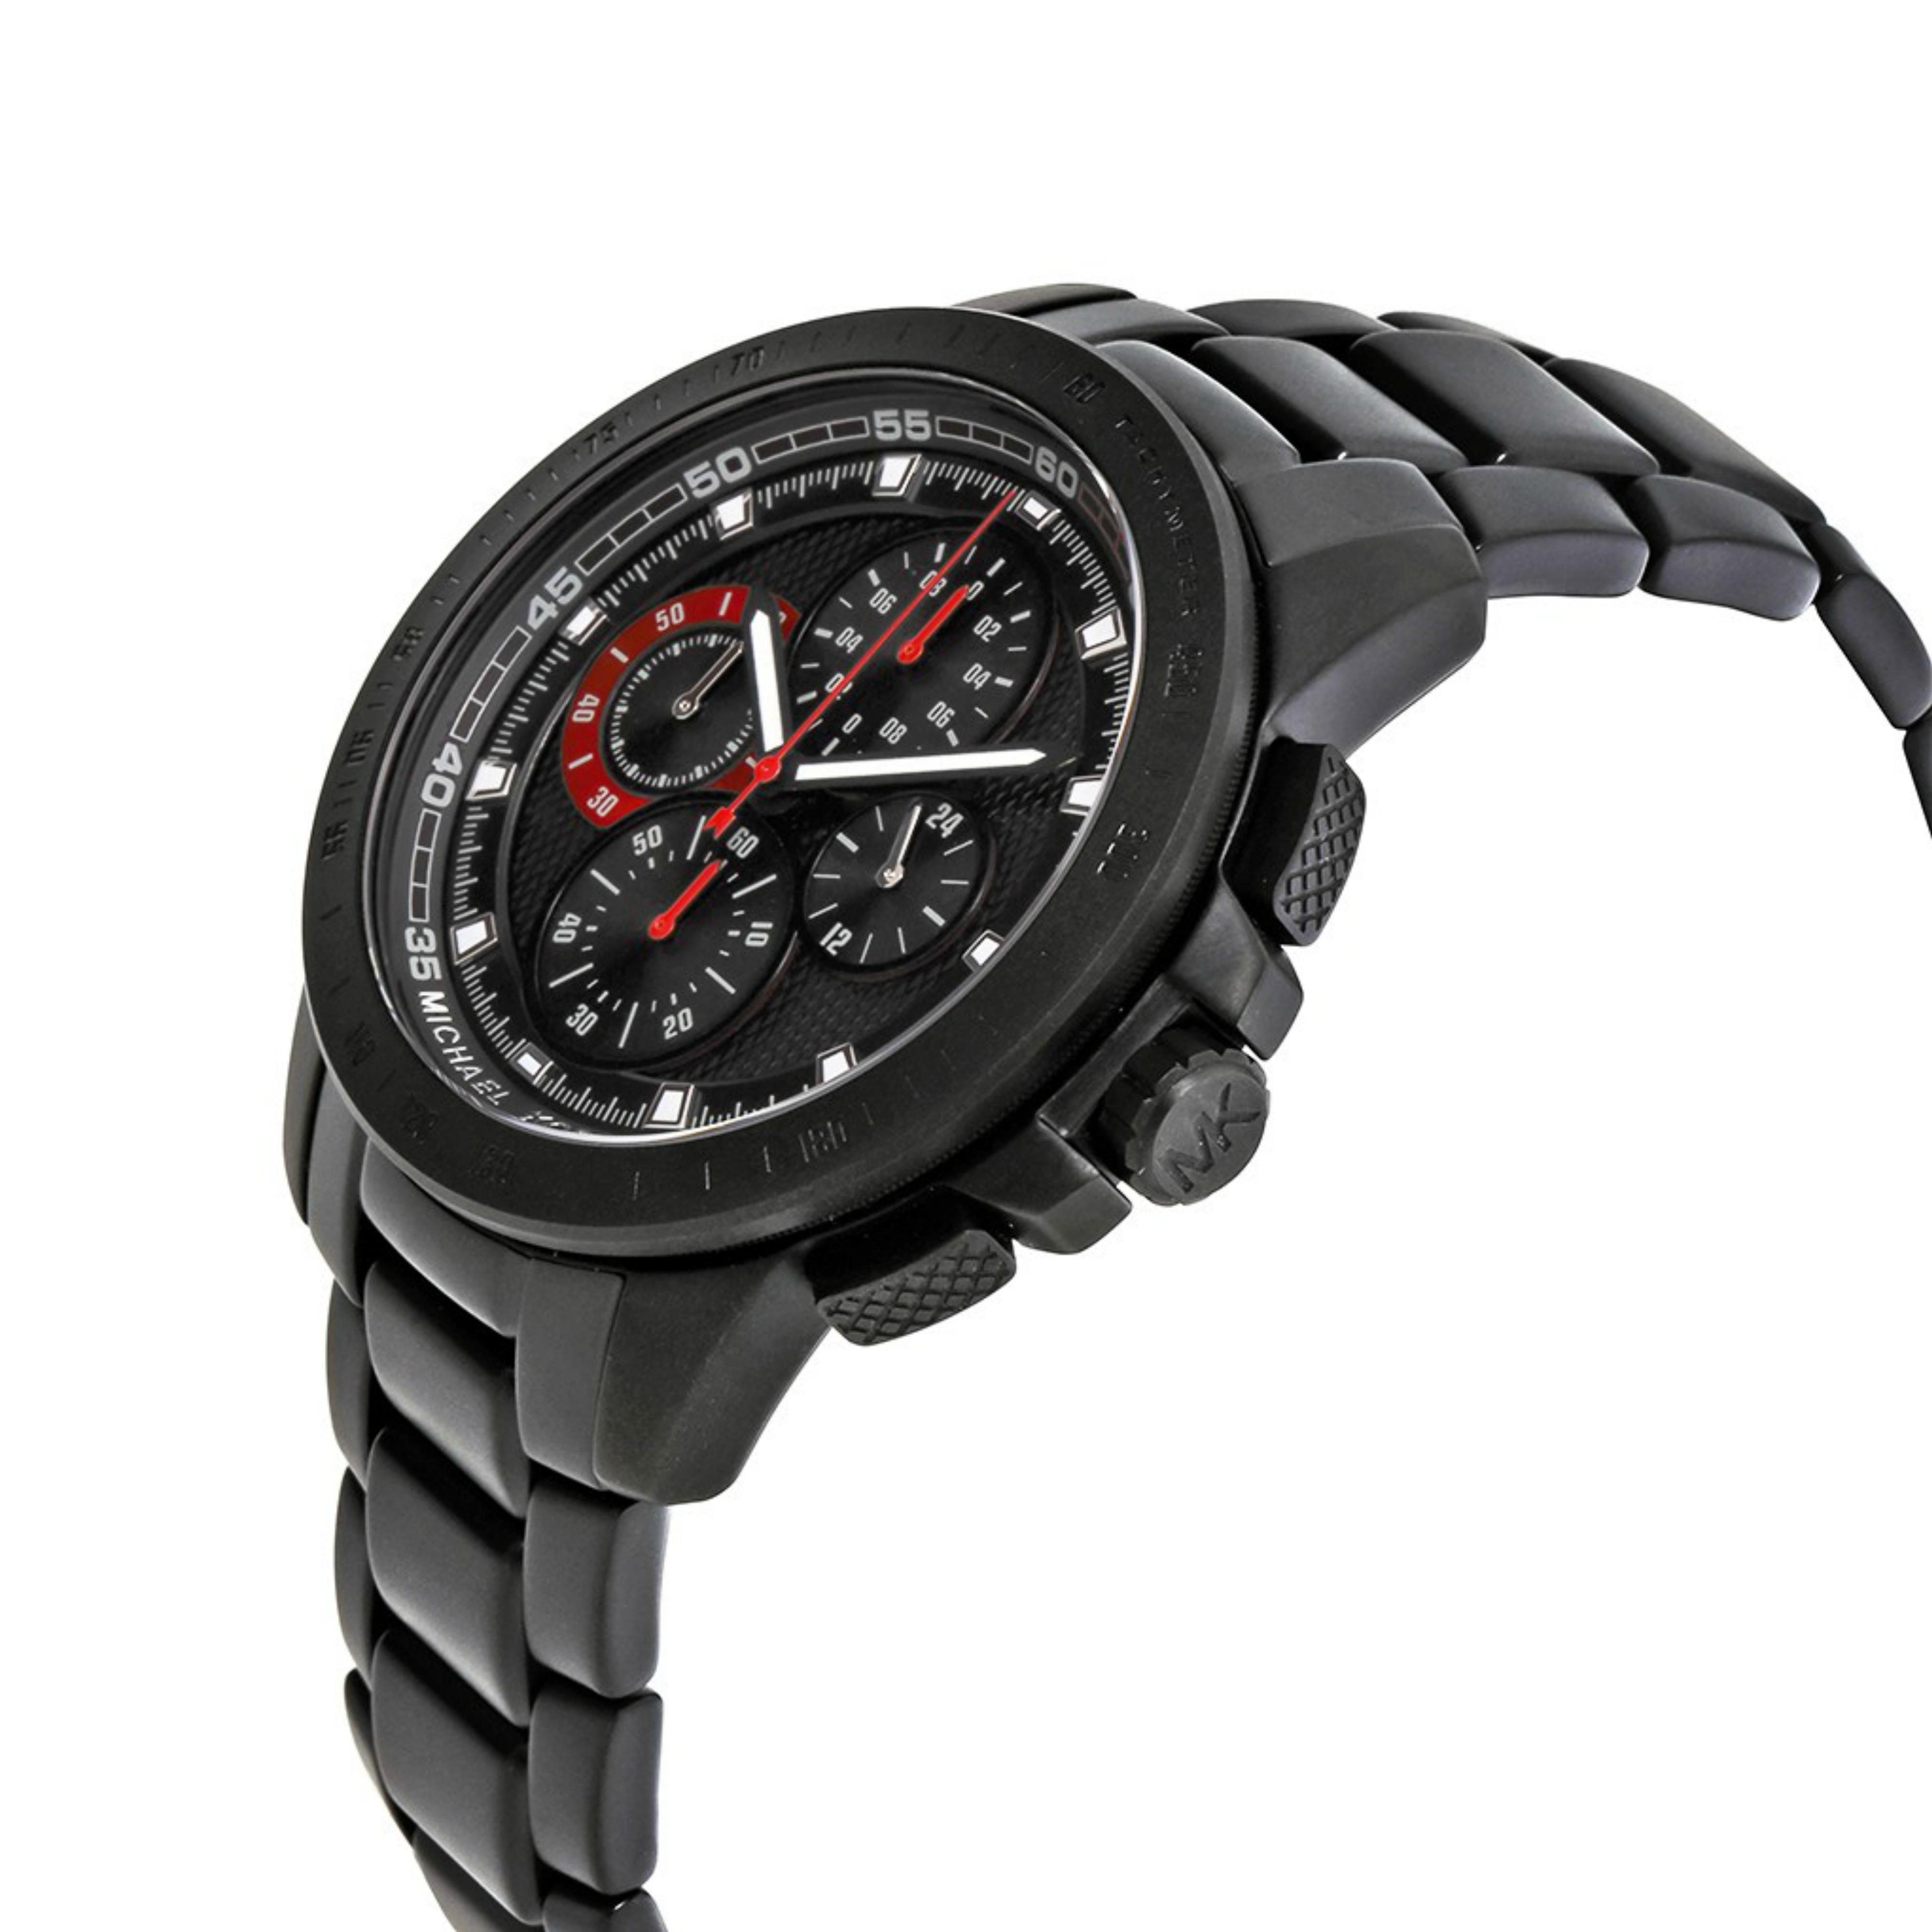 a46320be68ec Michael Kors Ryker Men s Black Dial Chronograph Round Analog Wrist Watch  MK8529 Thumbnail 2